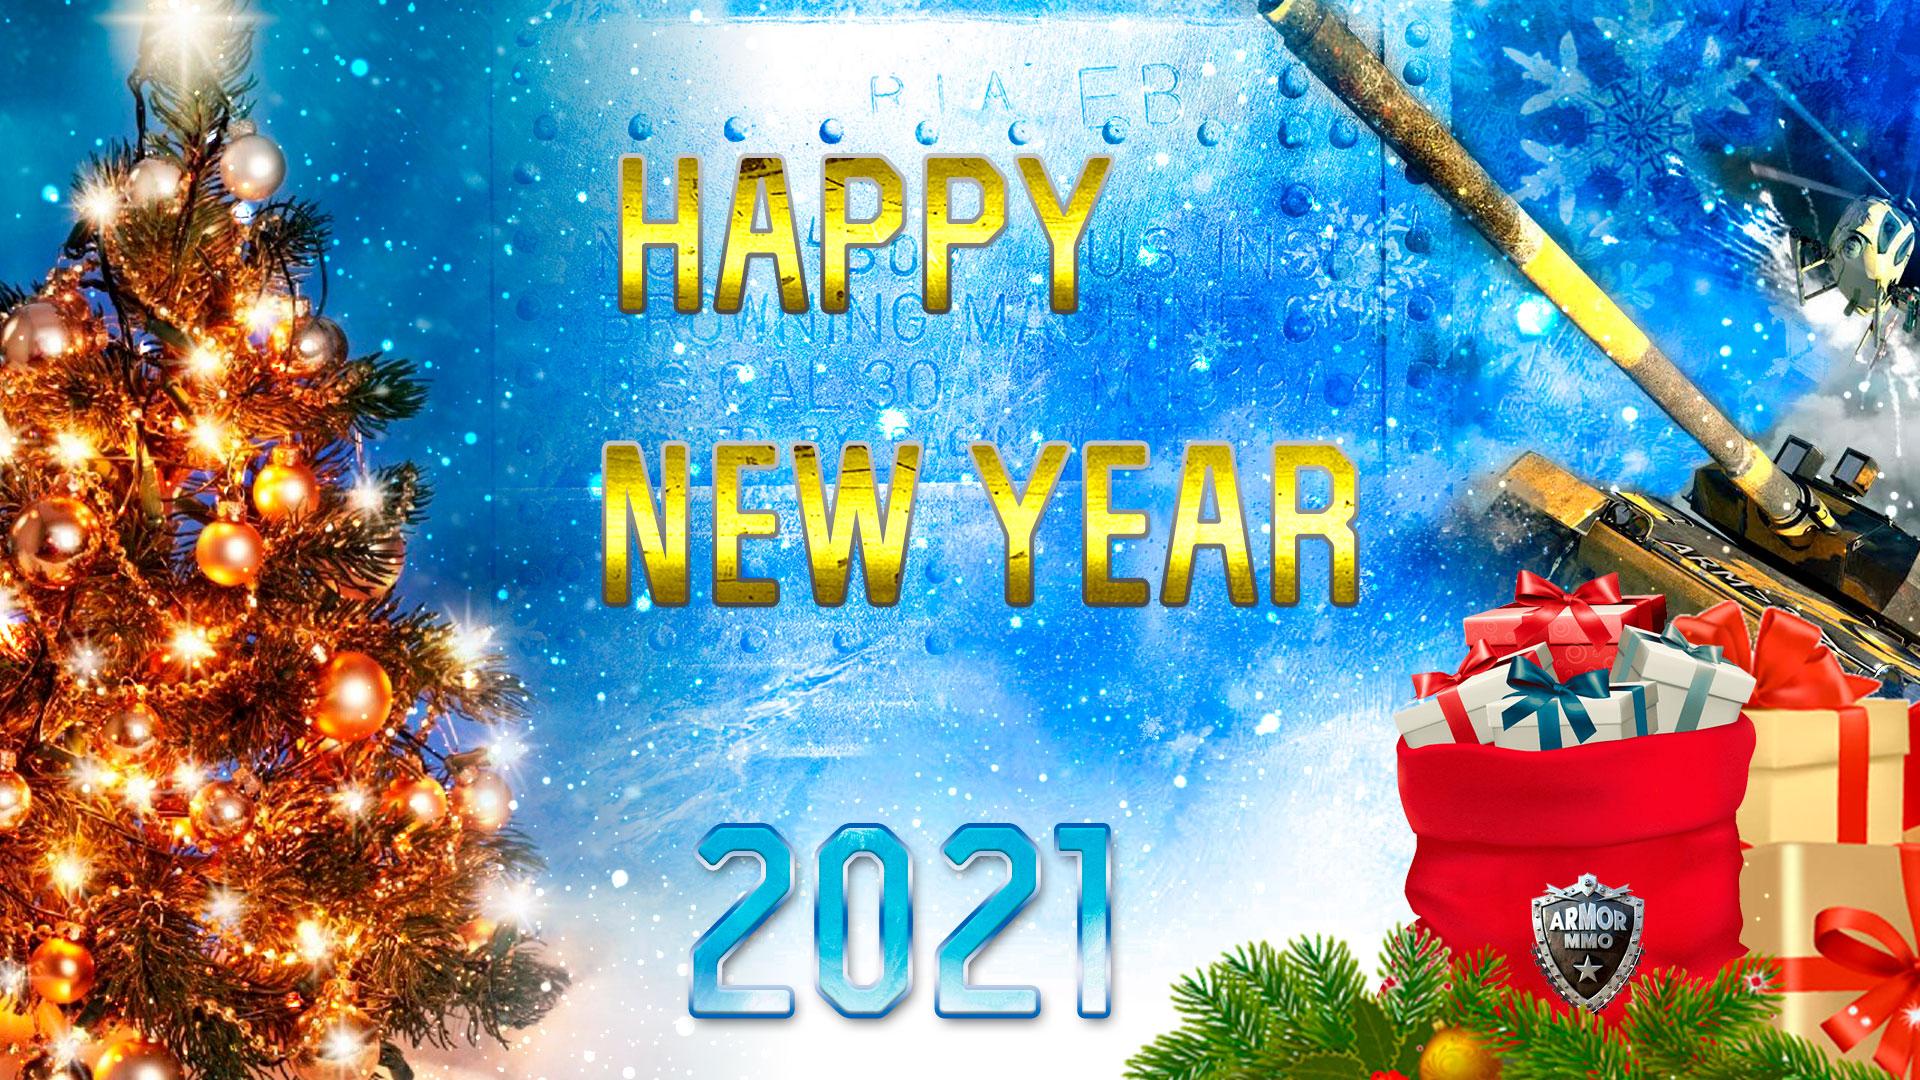 Happy 2021 New Year!